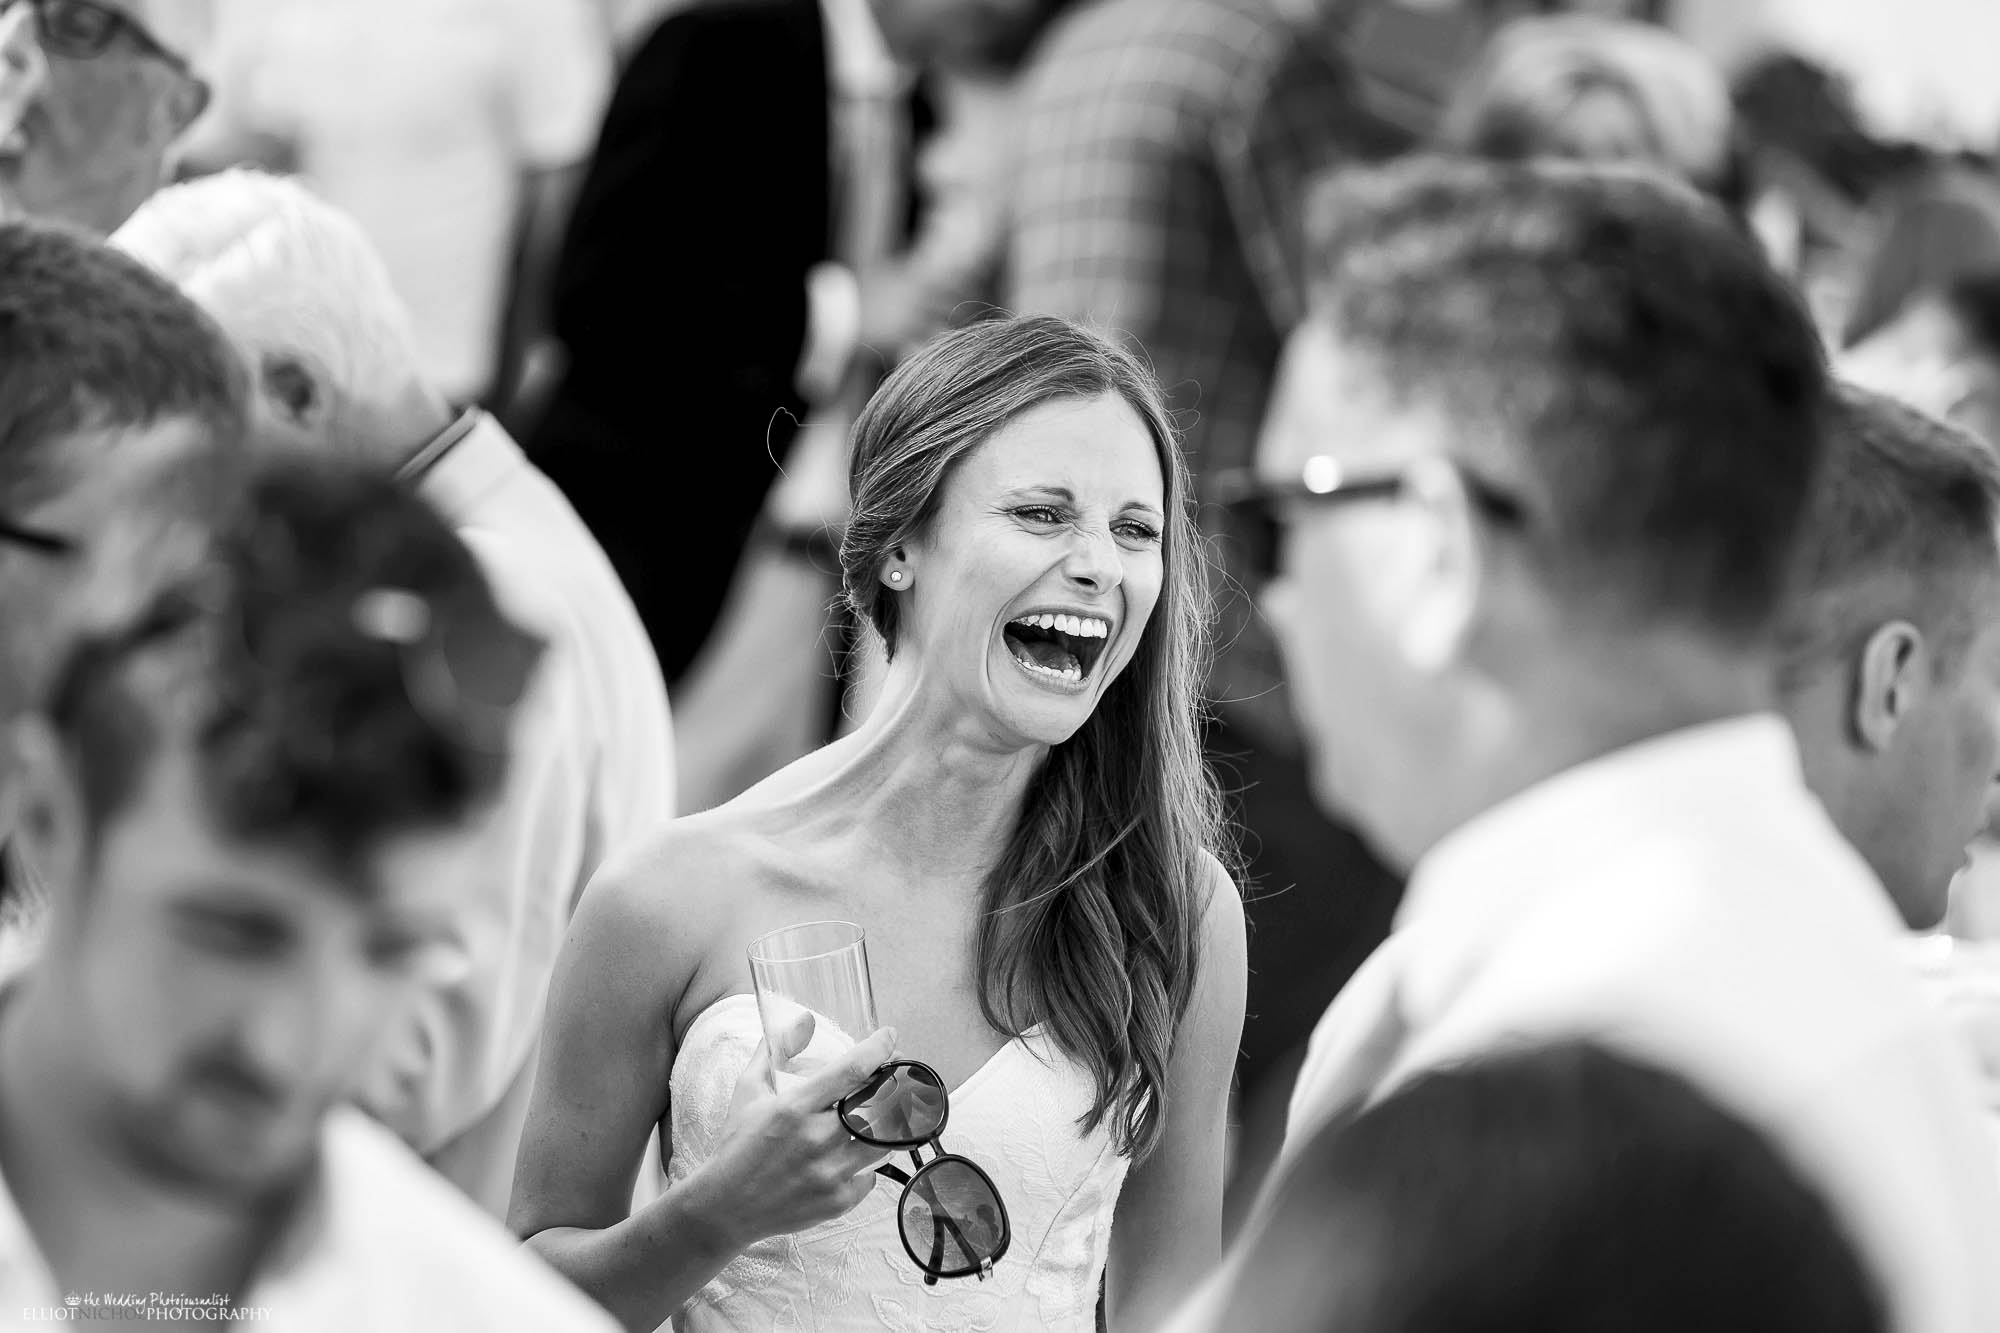 bride-wedding-reception-candid-fun-photography-North-East-photographer